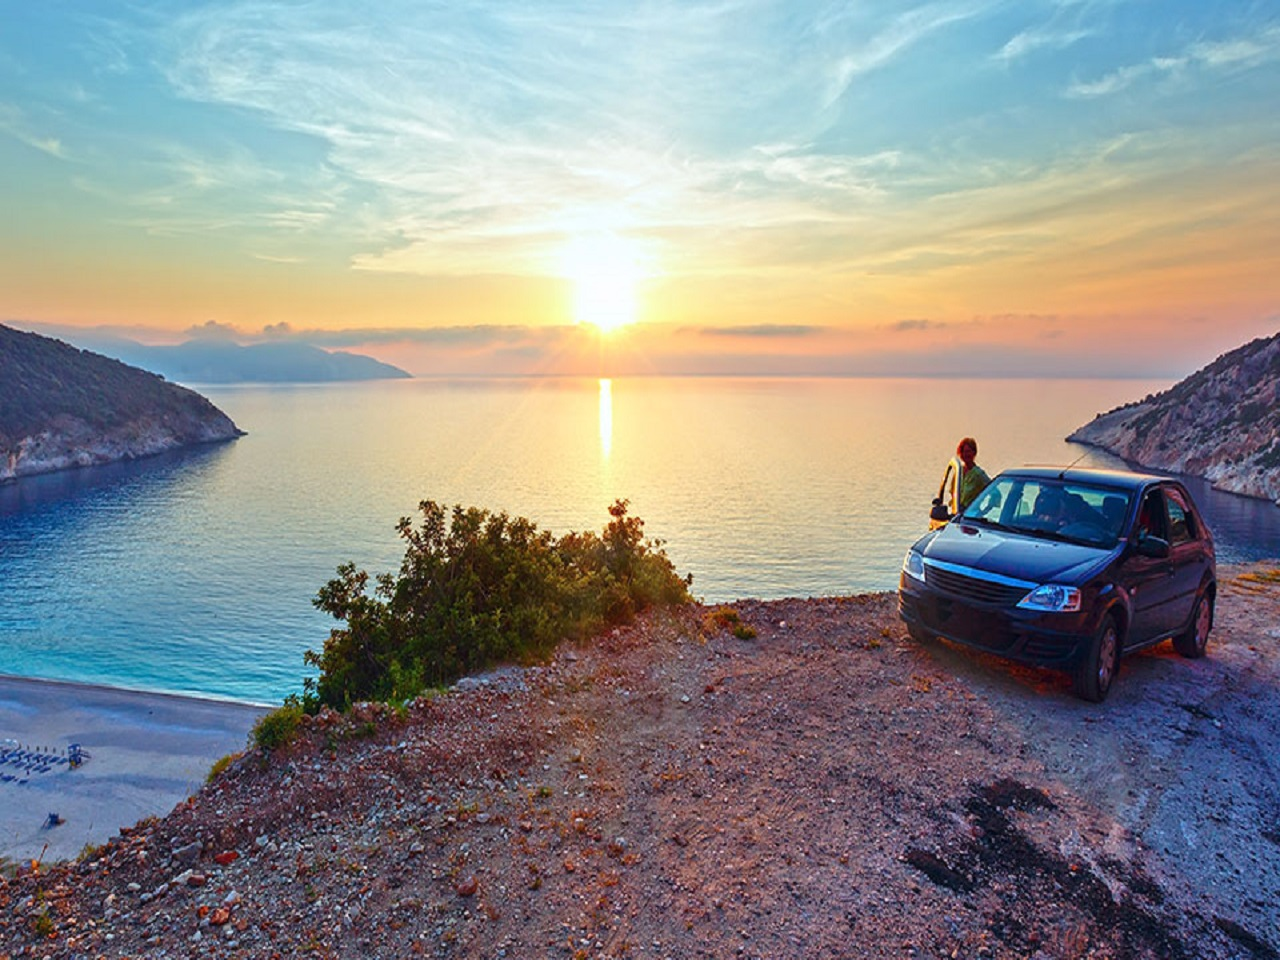 Explore Halkidiki by car